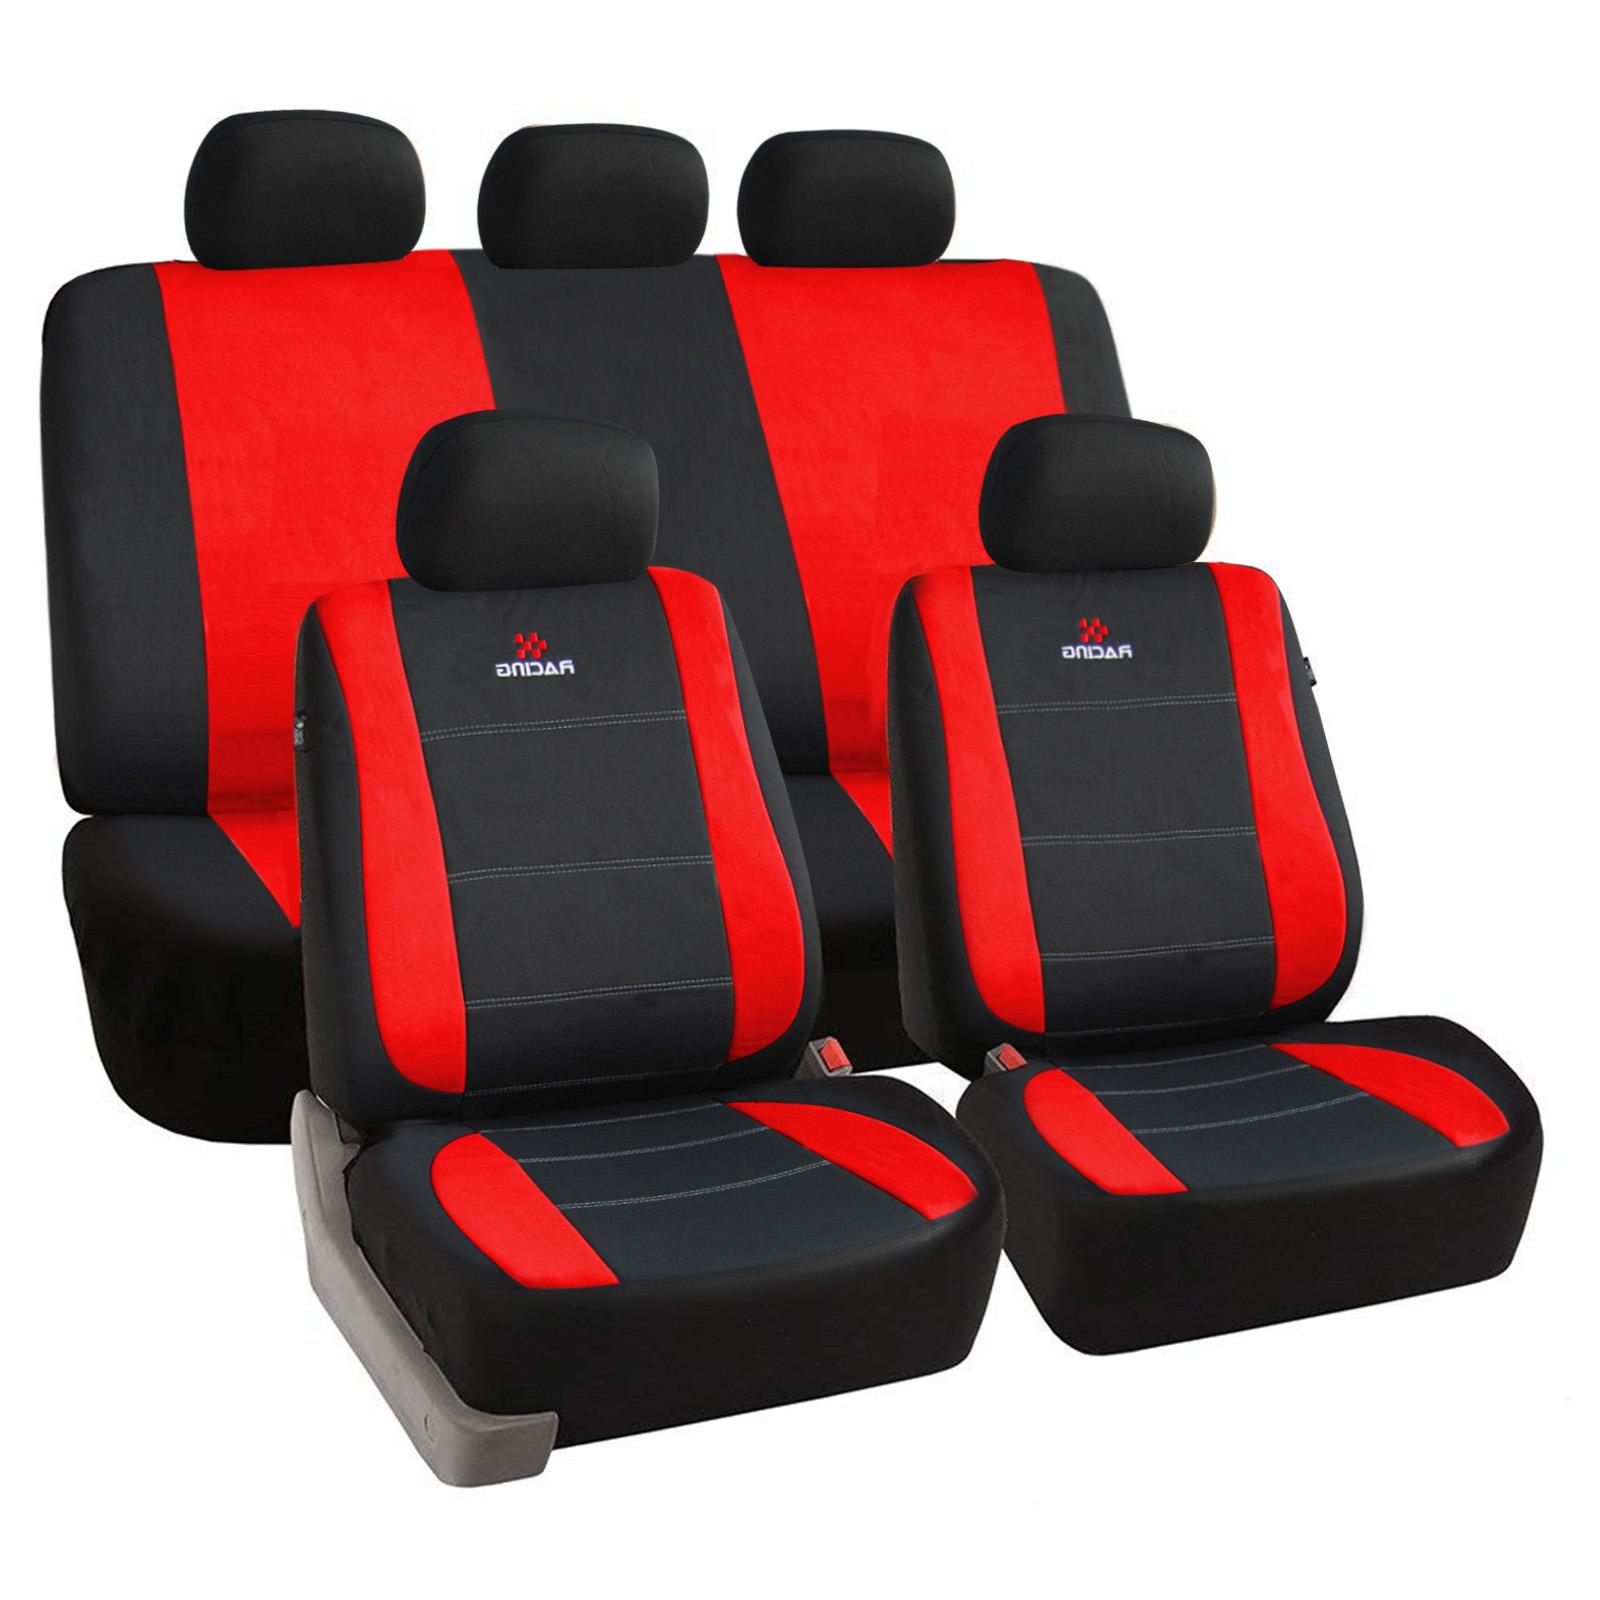 universal sitzbez ge f r auto schonbezug schoner komplettset schwarz rot scsc011 ebay. Black Bedroom Furniture Sets. Home Design Ideas